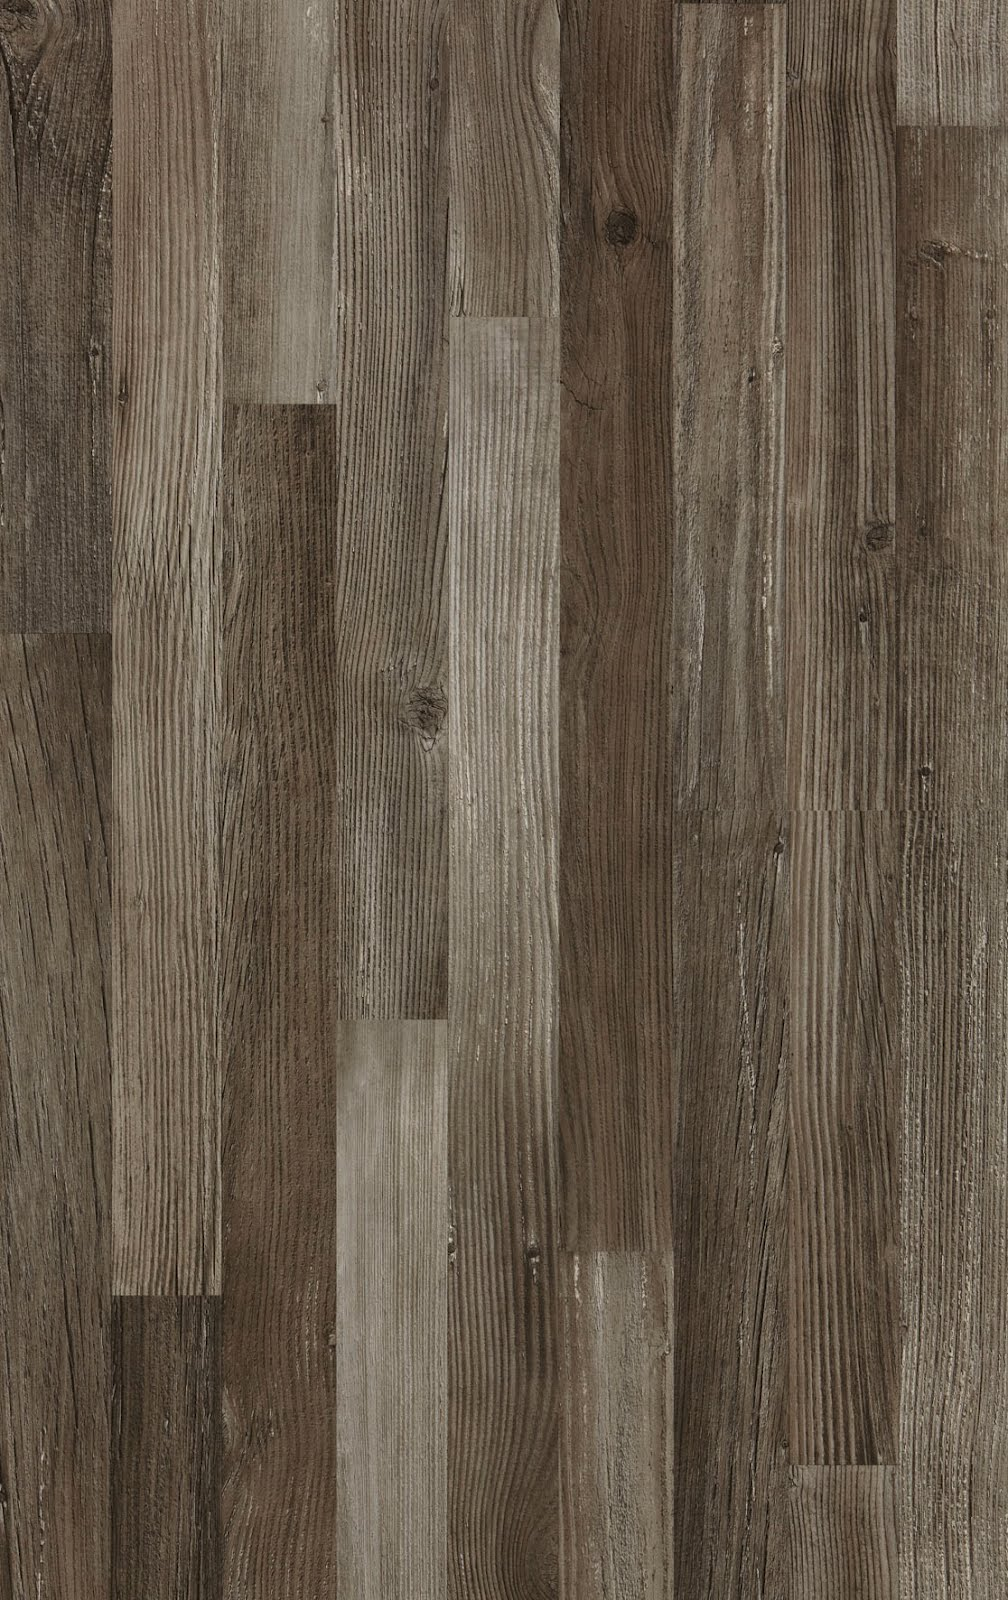 meister klick laminat lc50 6068 fichte grau 3 stab. Black Bedroom Furniture Sets. Home Design Ideas